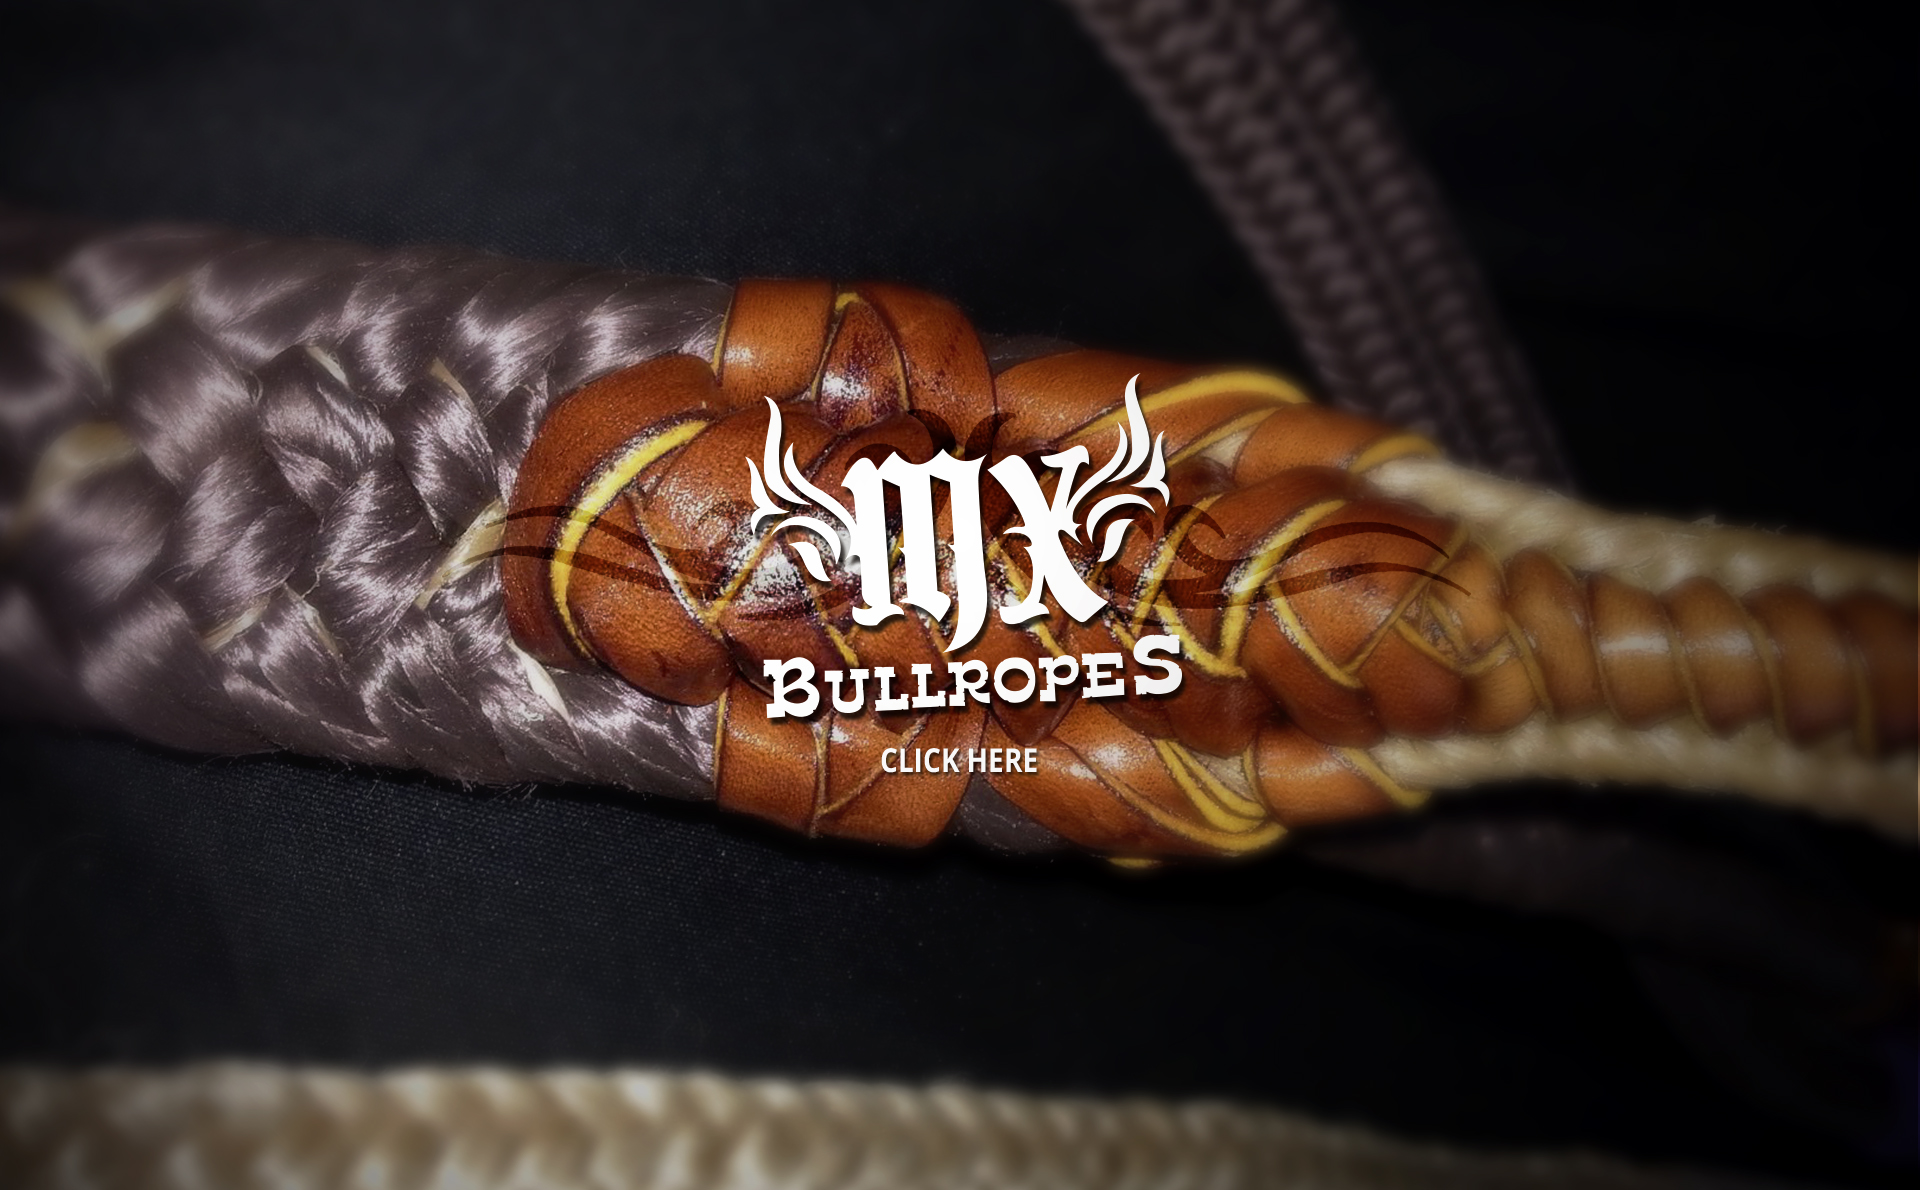 MxBullropesLandingPage